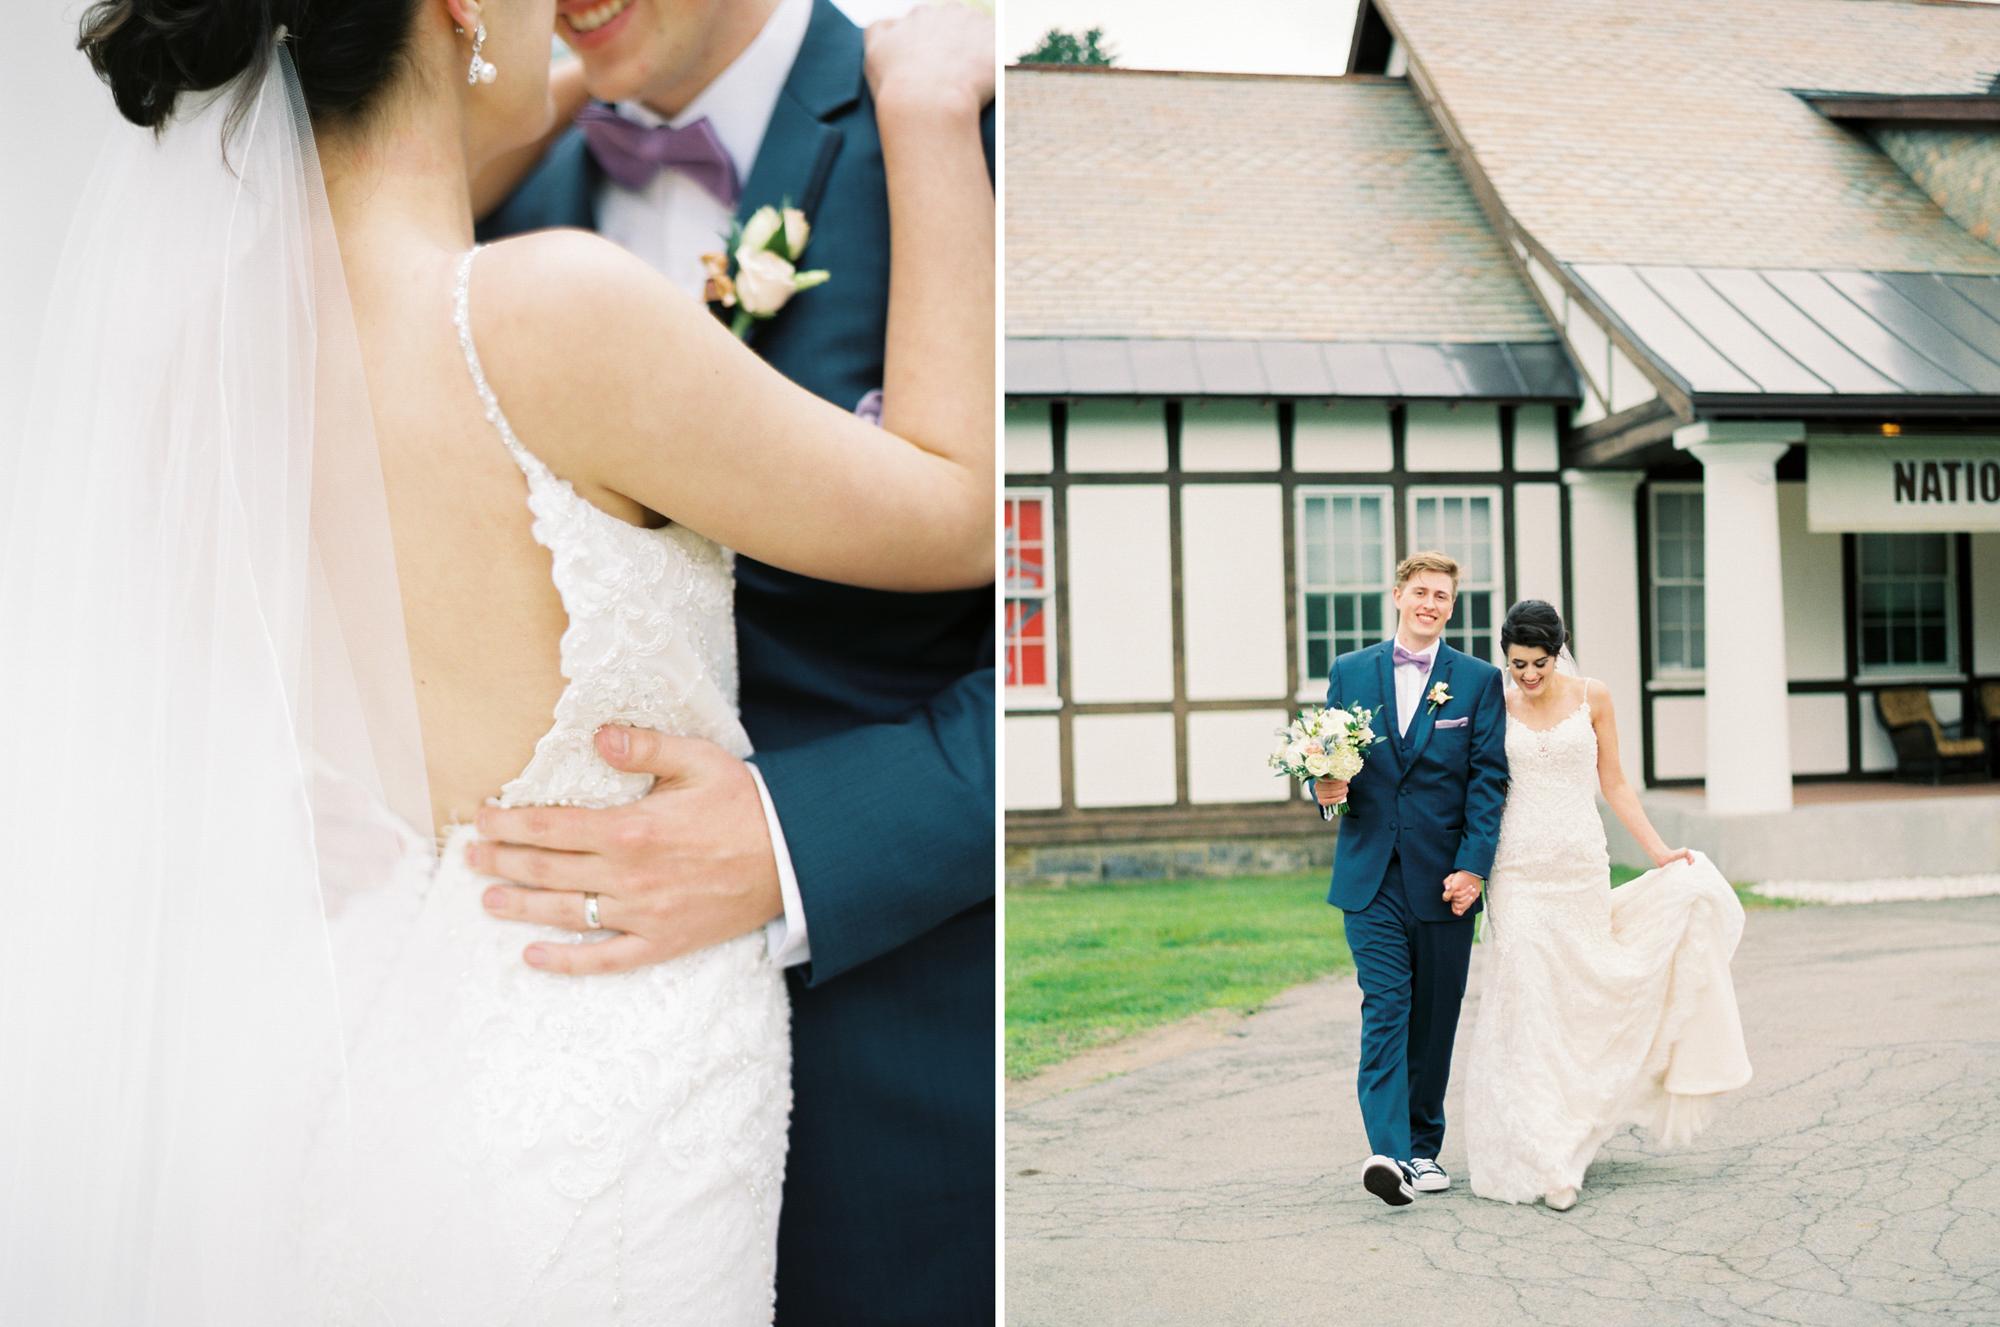 saratoga-springs-national-dance-eclectic-downtown-charlotte-film-wedding-photographer-carousel-23.jpg